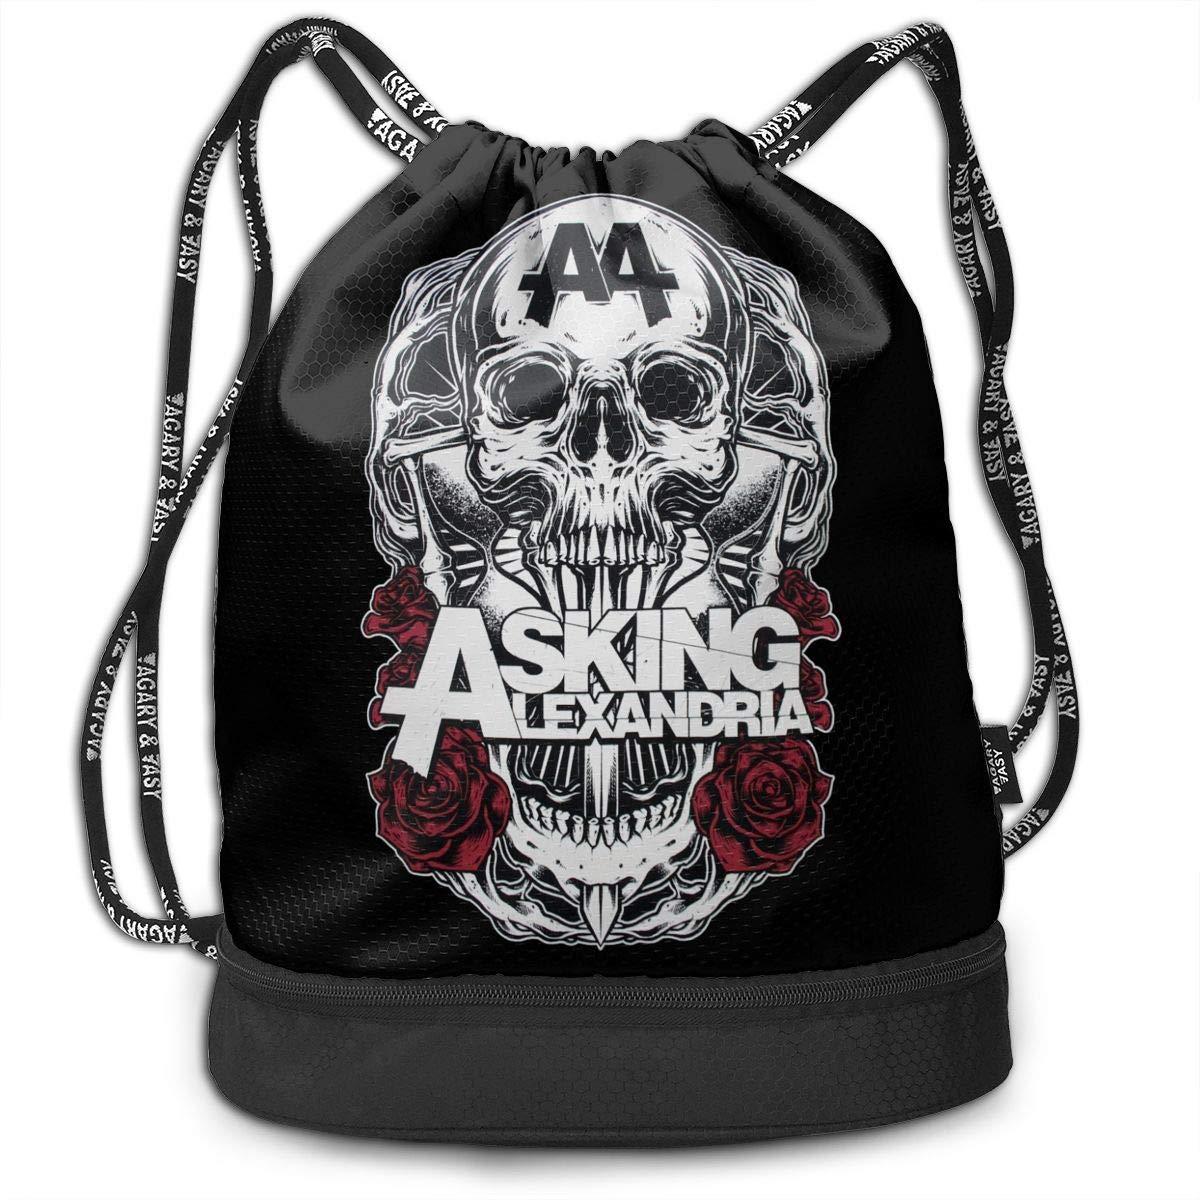 AgoodShop Asking Alexandria Band Drawstring Backpack Sport Gym Travel Bag